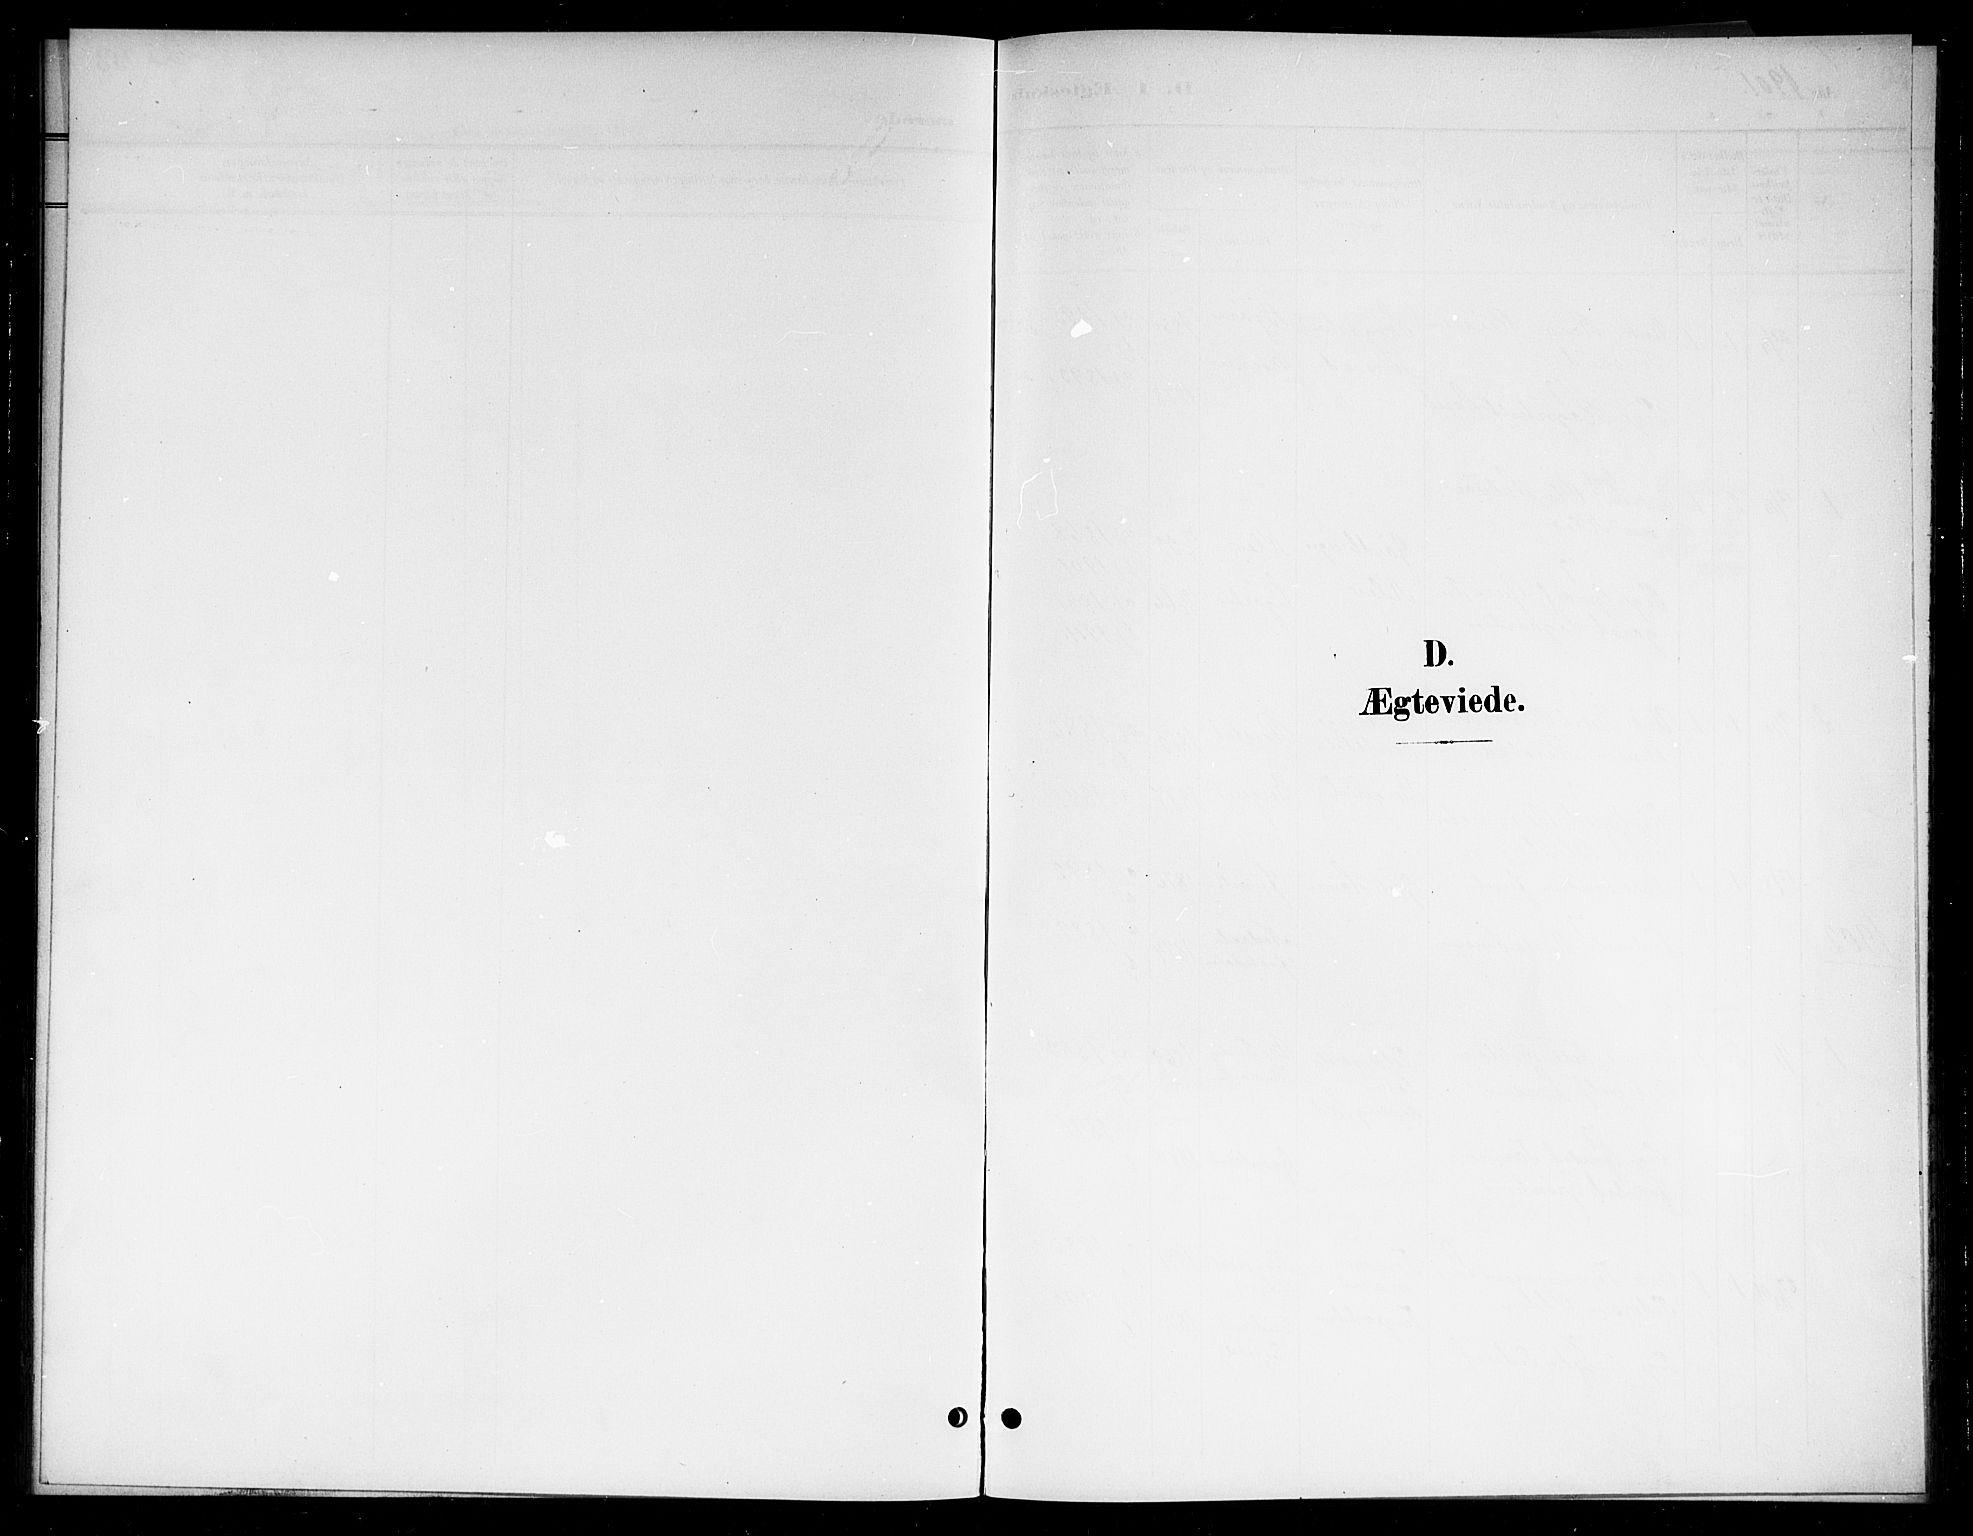 SAKO, Sigdal kirkebøker, G/Gb/L0003: Klokkerbok nr. II 3, 1901-1916